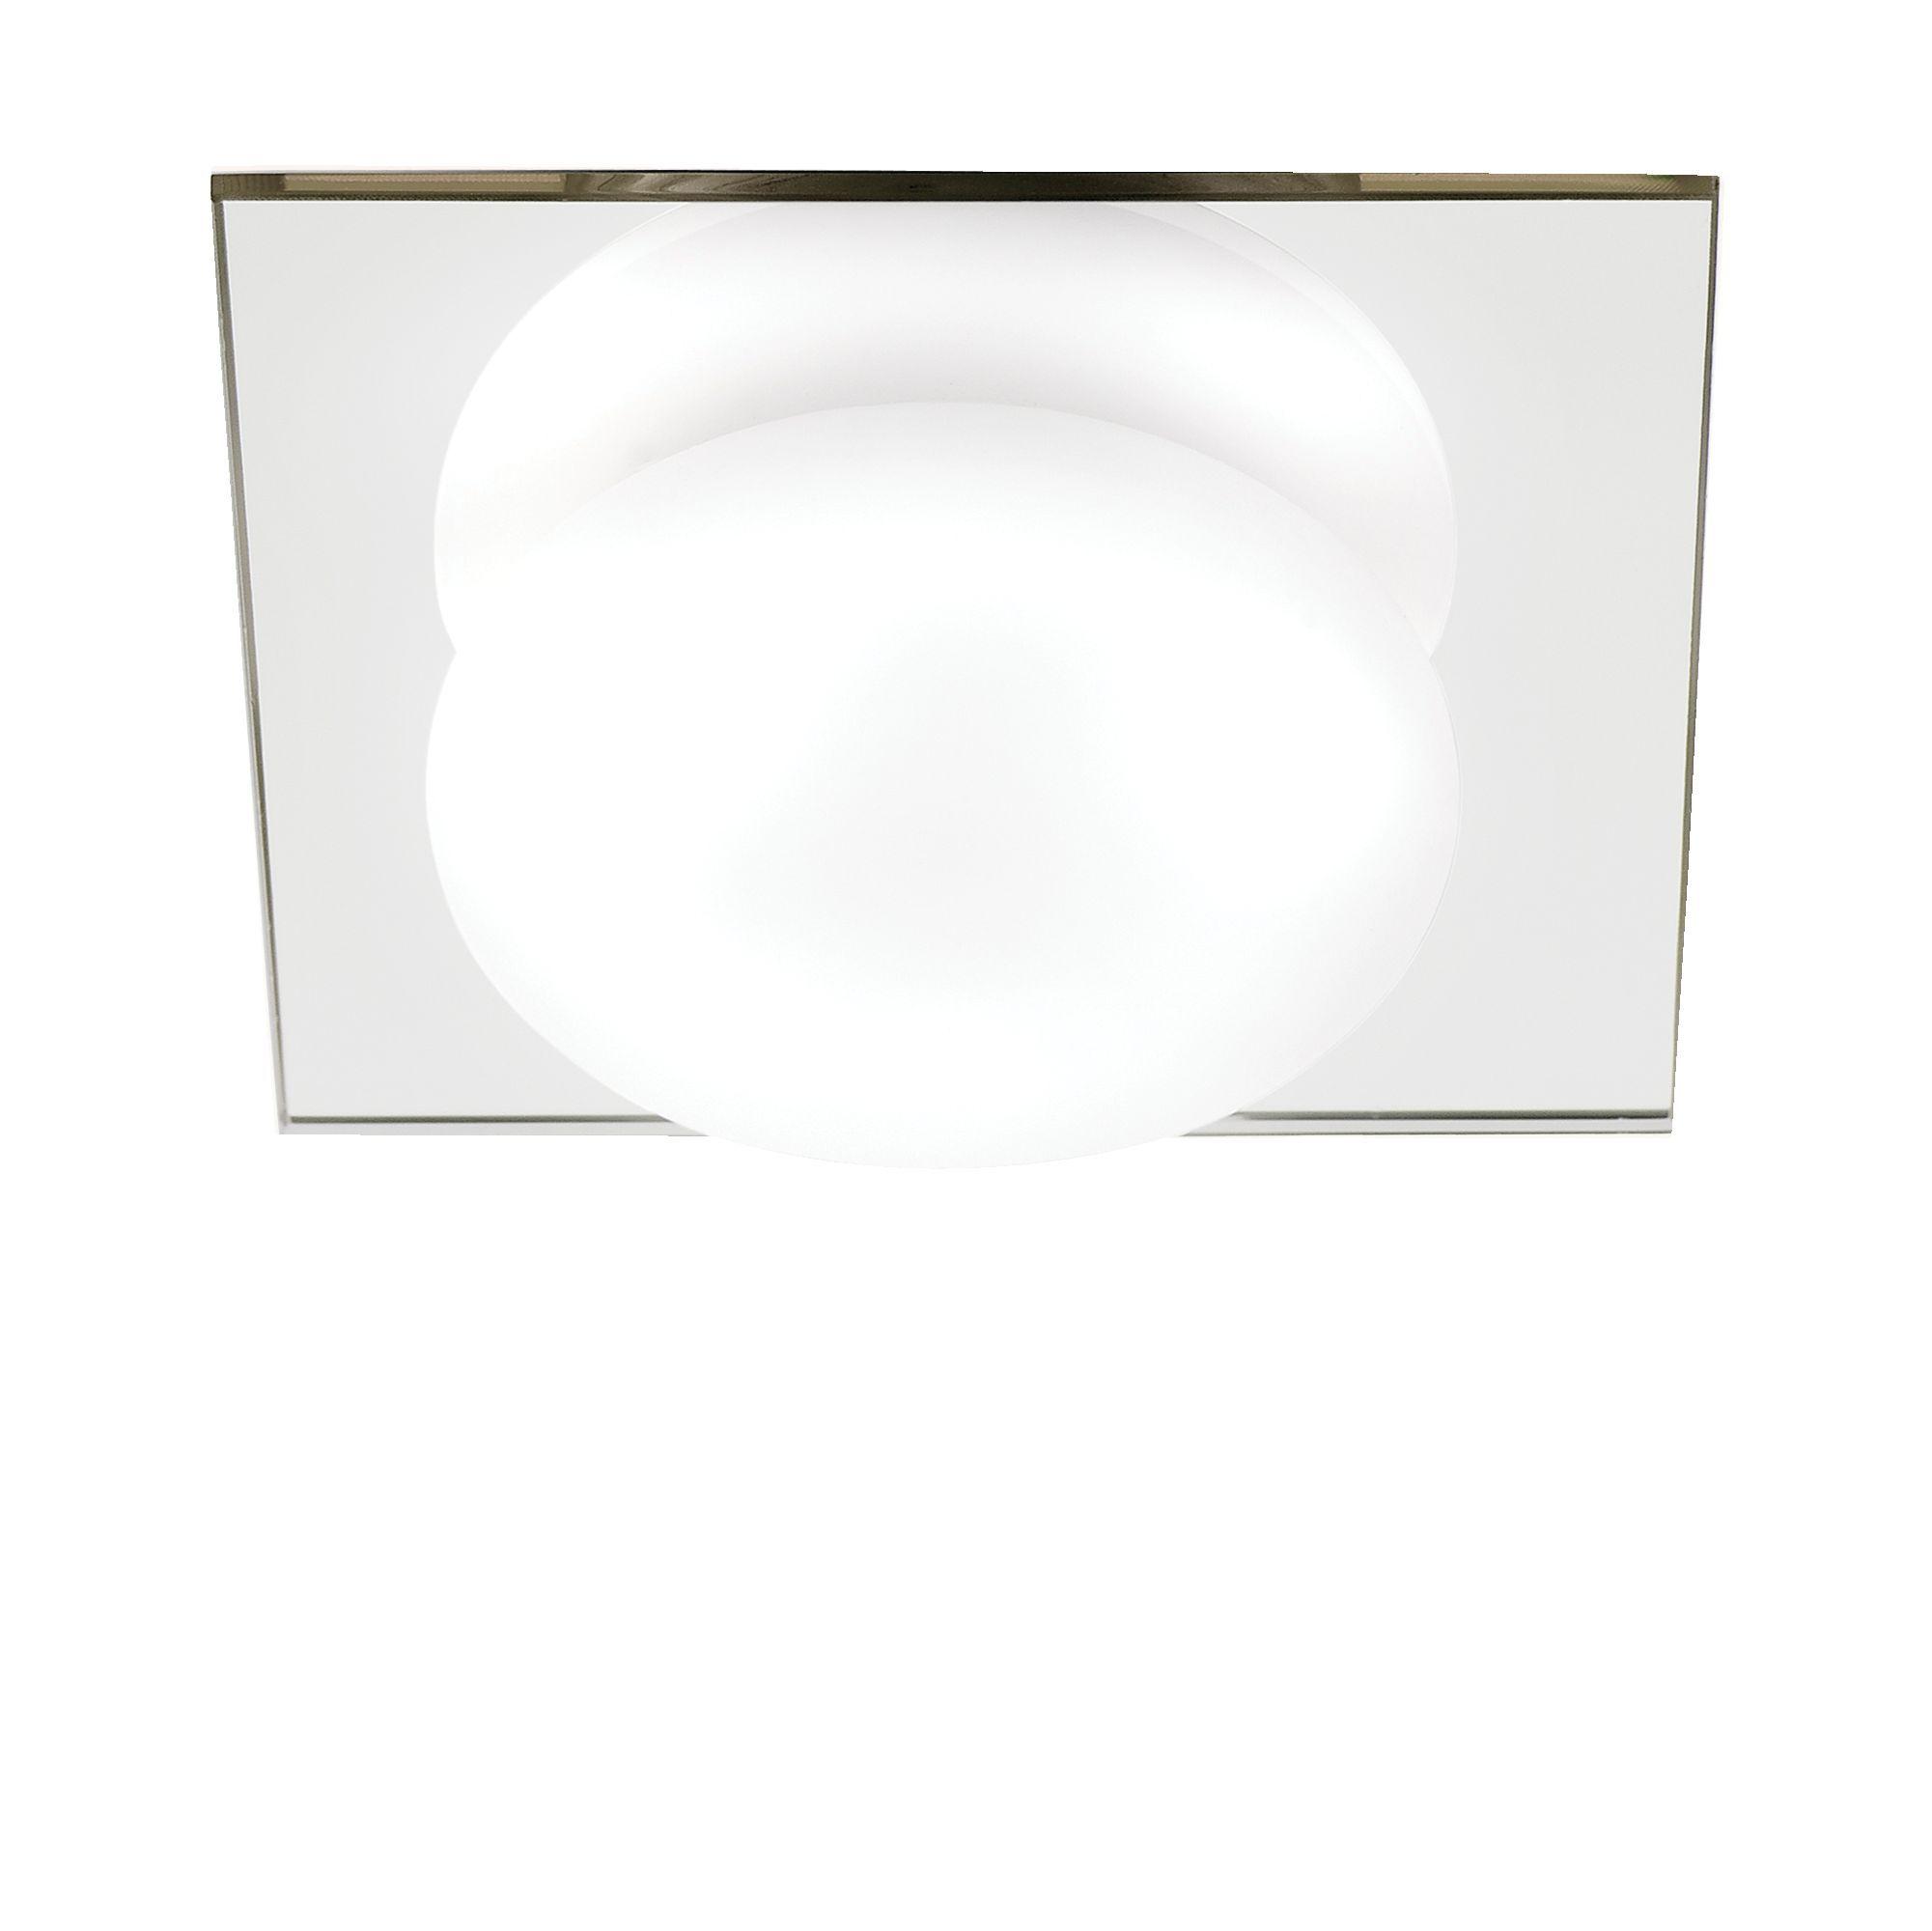 Revel clear mirrored effect bathroom flush light diy and crafts lights by bq g9 halogen bathroom flush light 25 w rooms diy at bq aloadofball Image collections